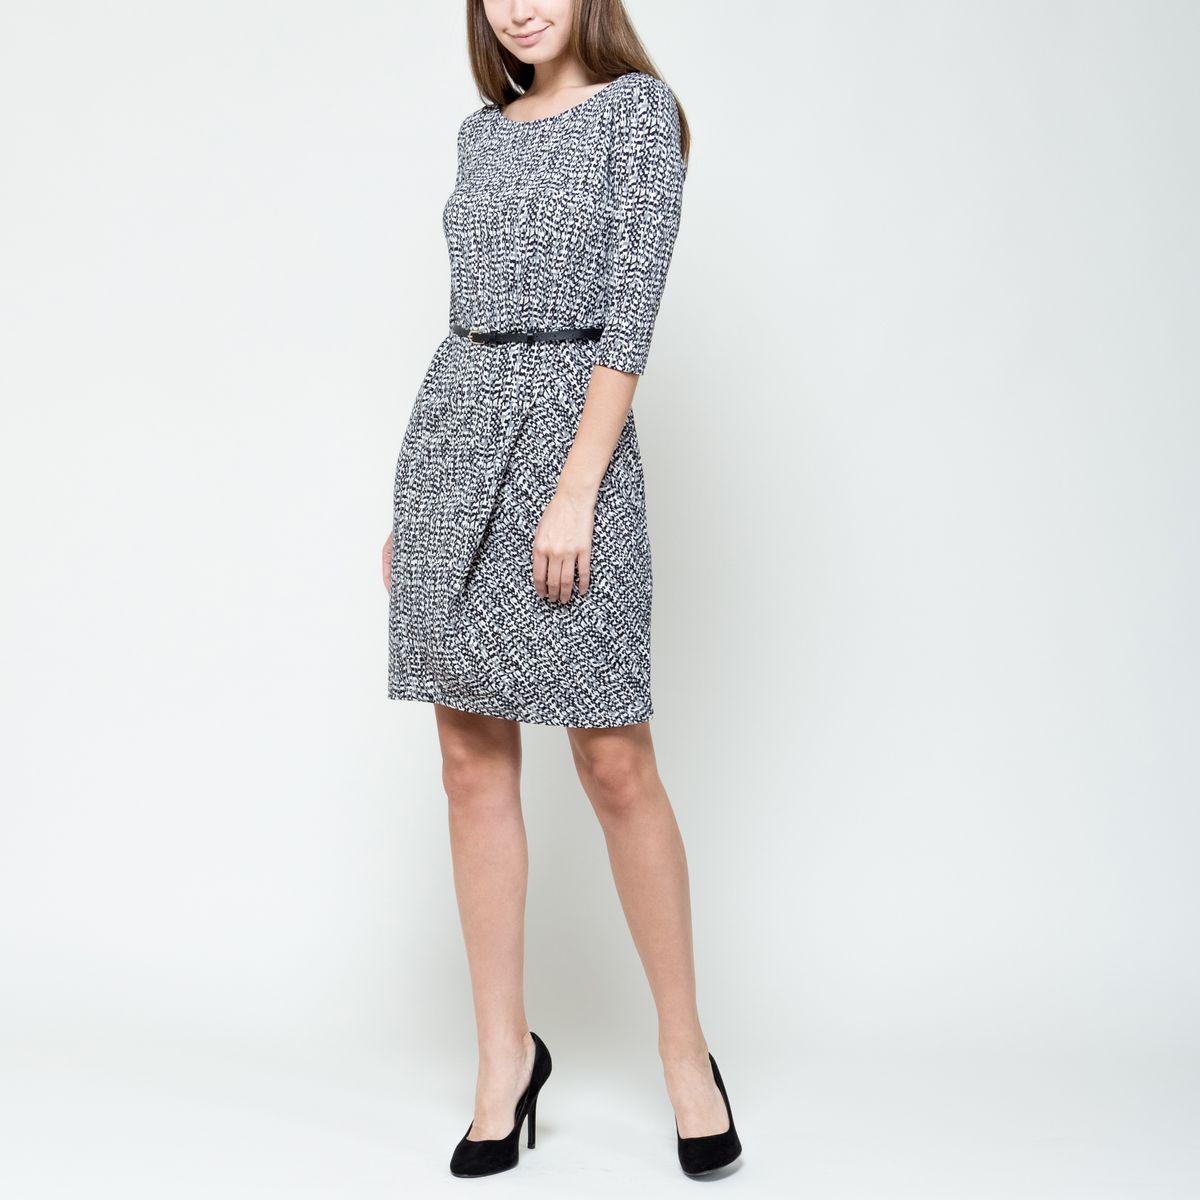 Платье Sela, цвет: черный, серый, белый. DK-117/1017-6391. Размер XS (42) sela se001ebotd99